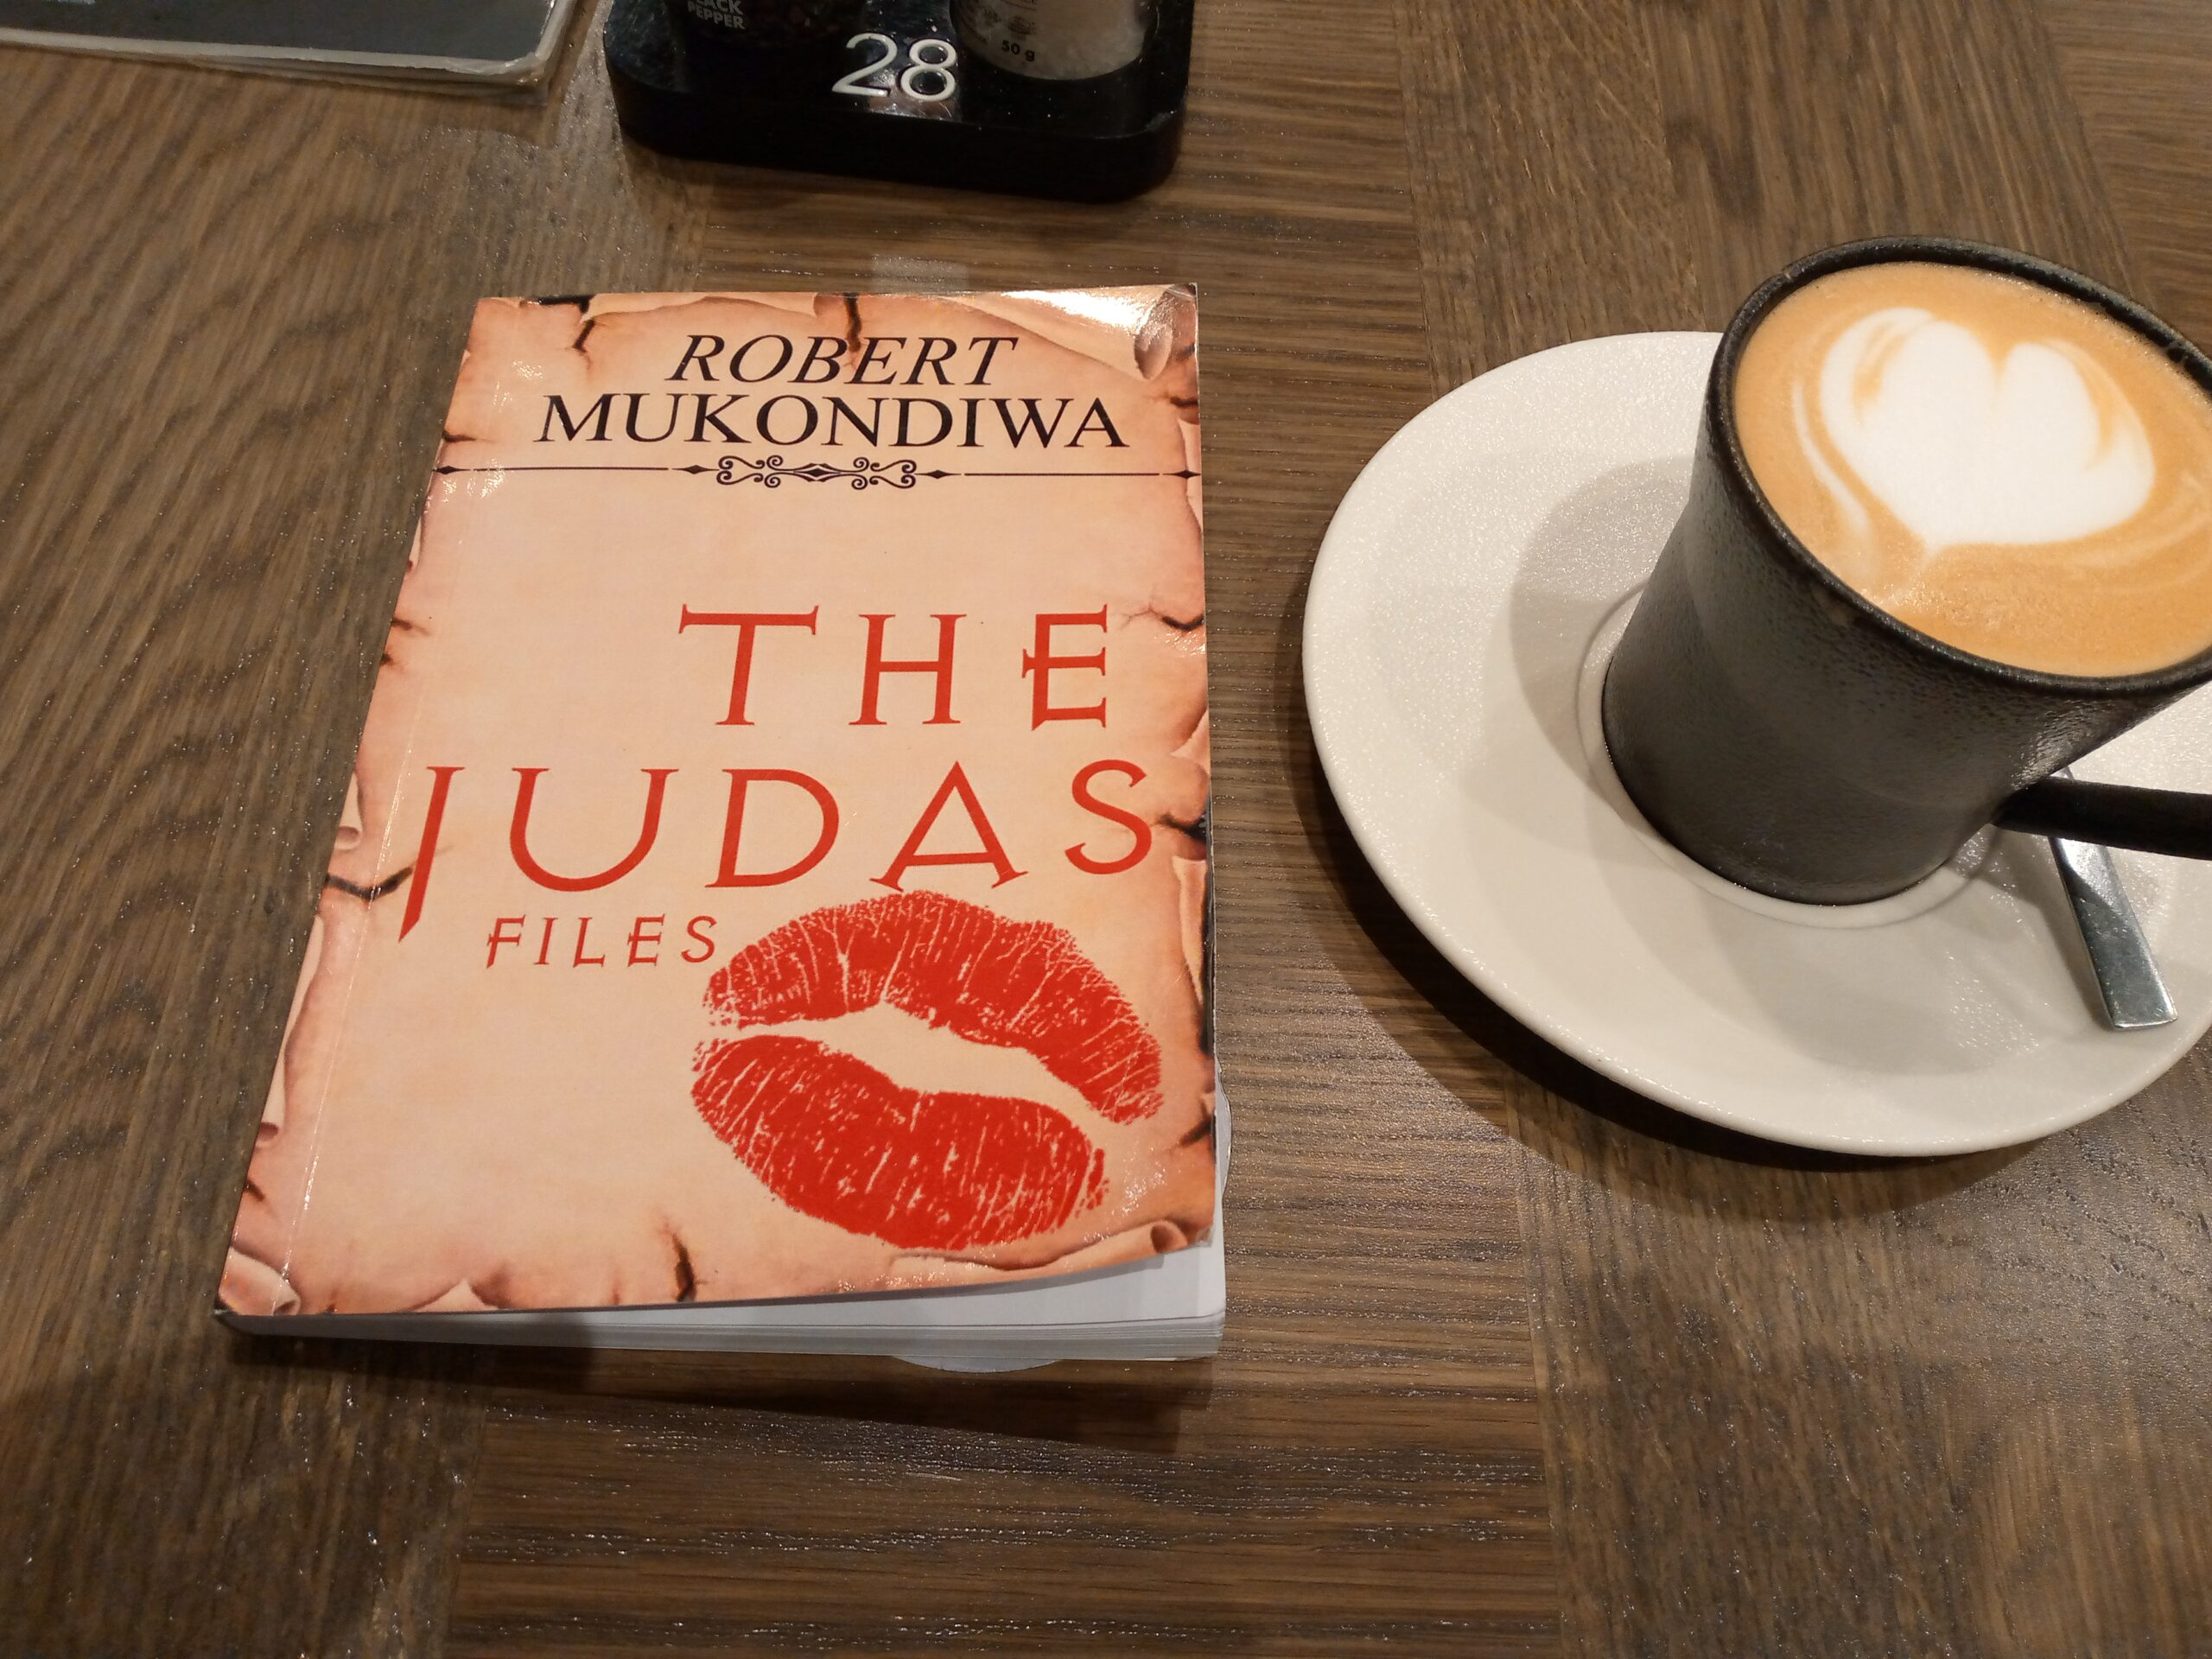 Bob Mukondiwa's, The Judas Files: Book Review